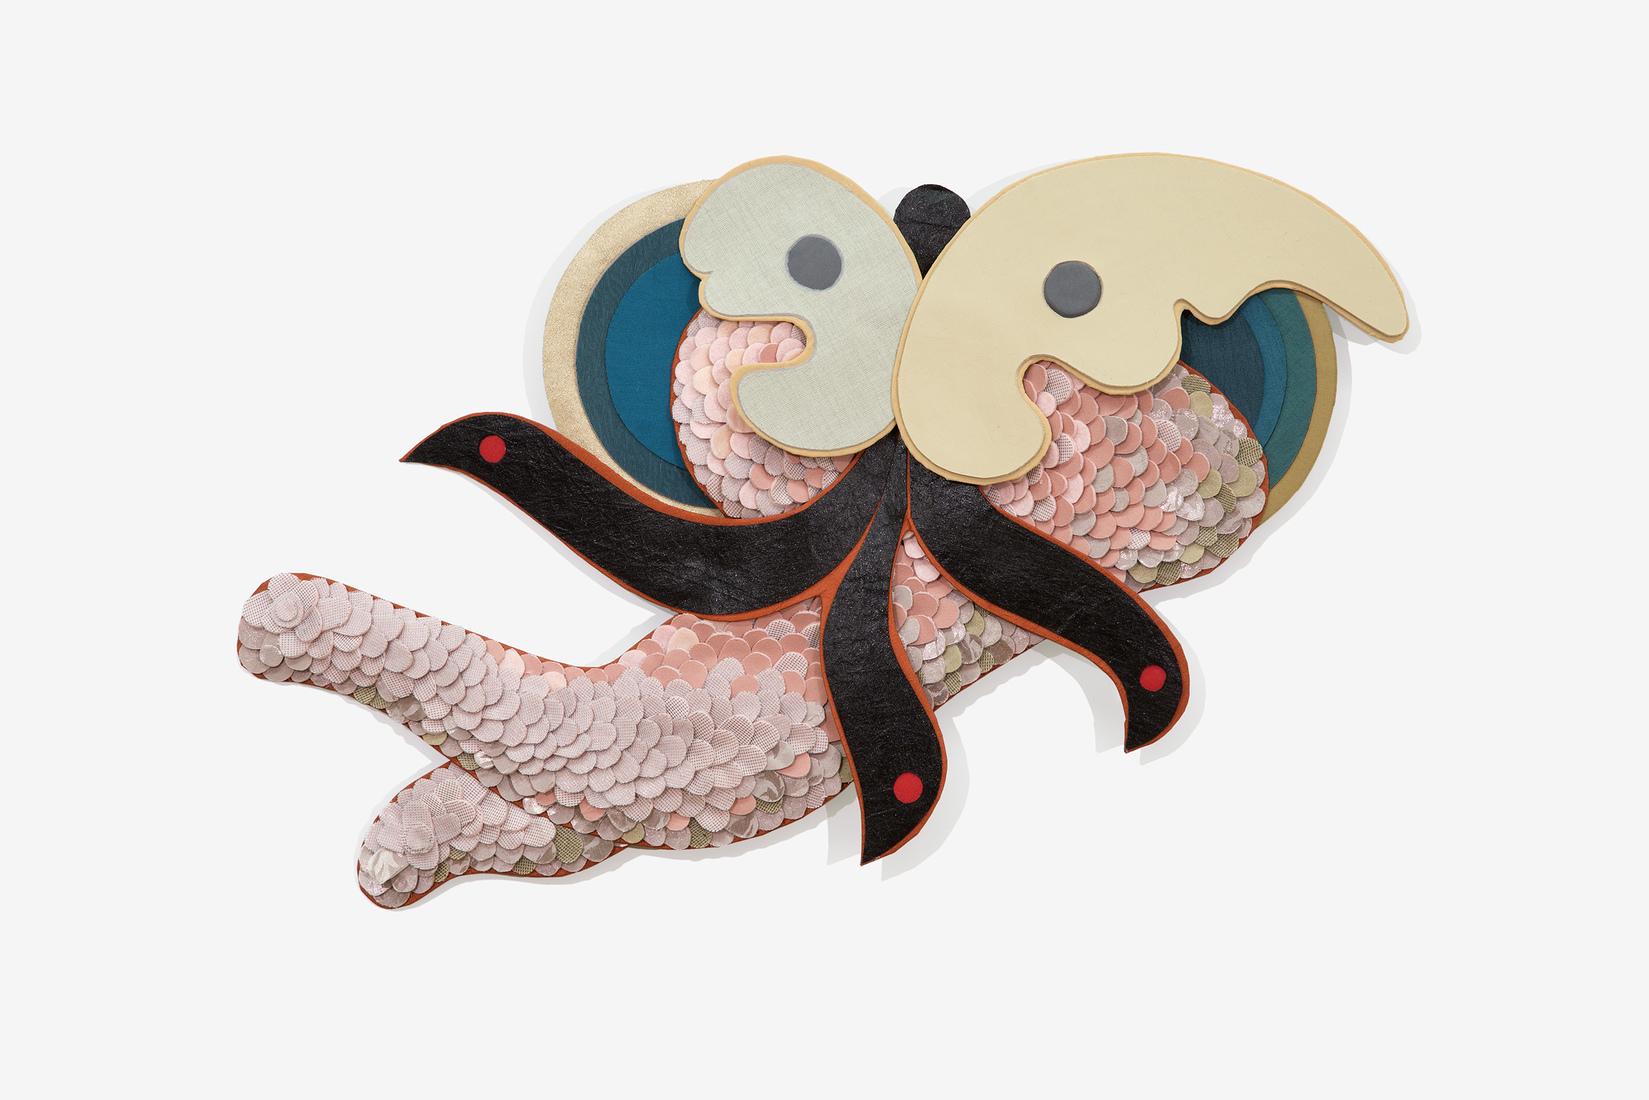 GERHARDT KNODEL Minglings: A Journey Across Time: 2015-2017 #3. Yun